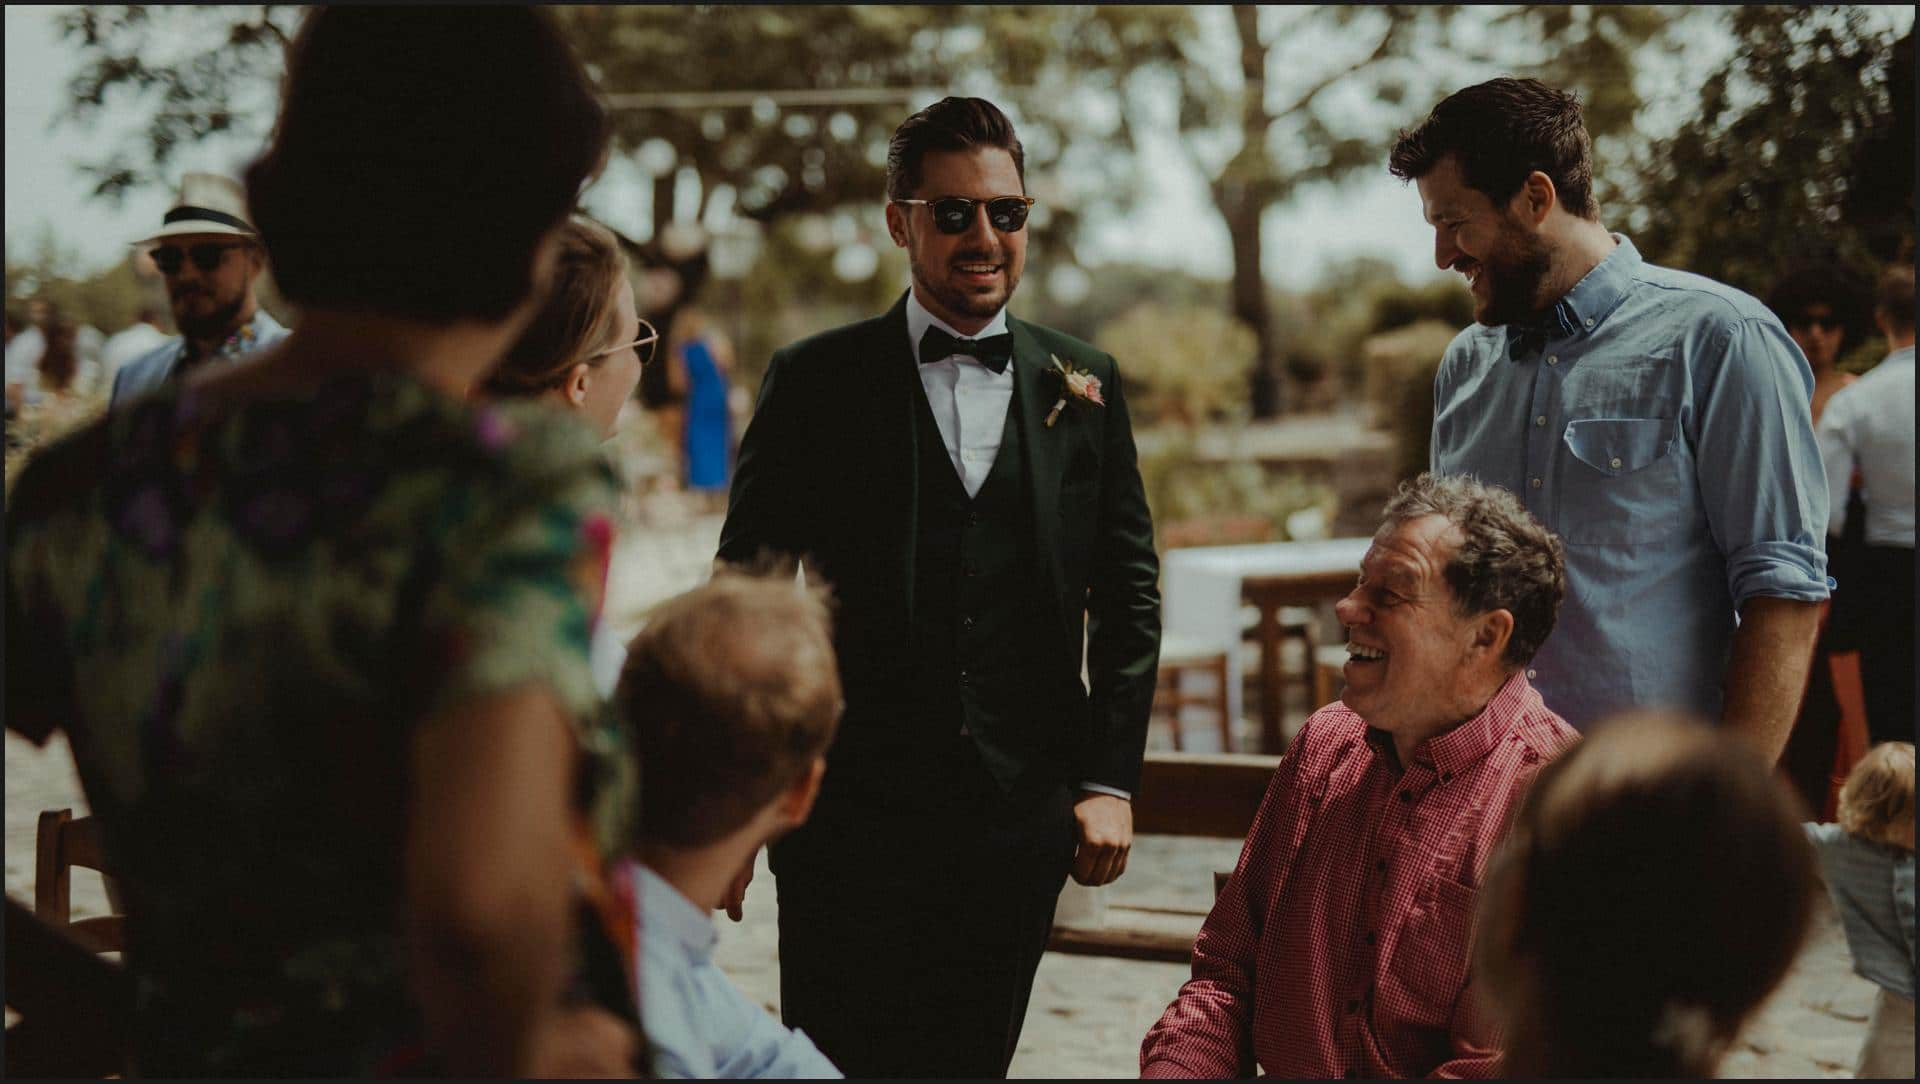 borgo di tragliata, wedding, rome, wedding in rome, groom, wedding in italy